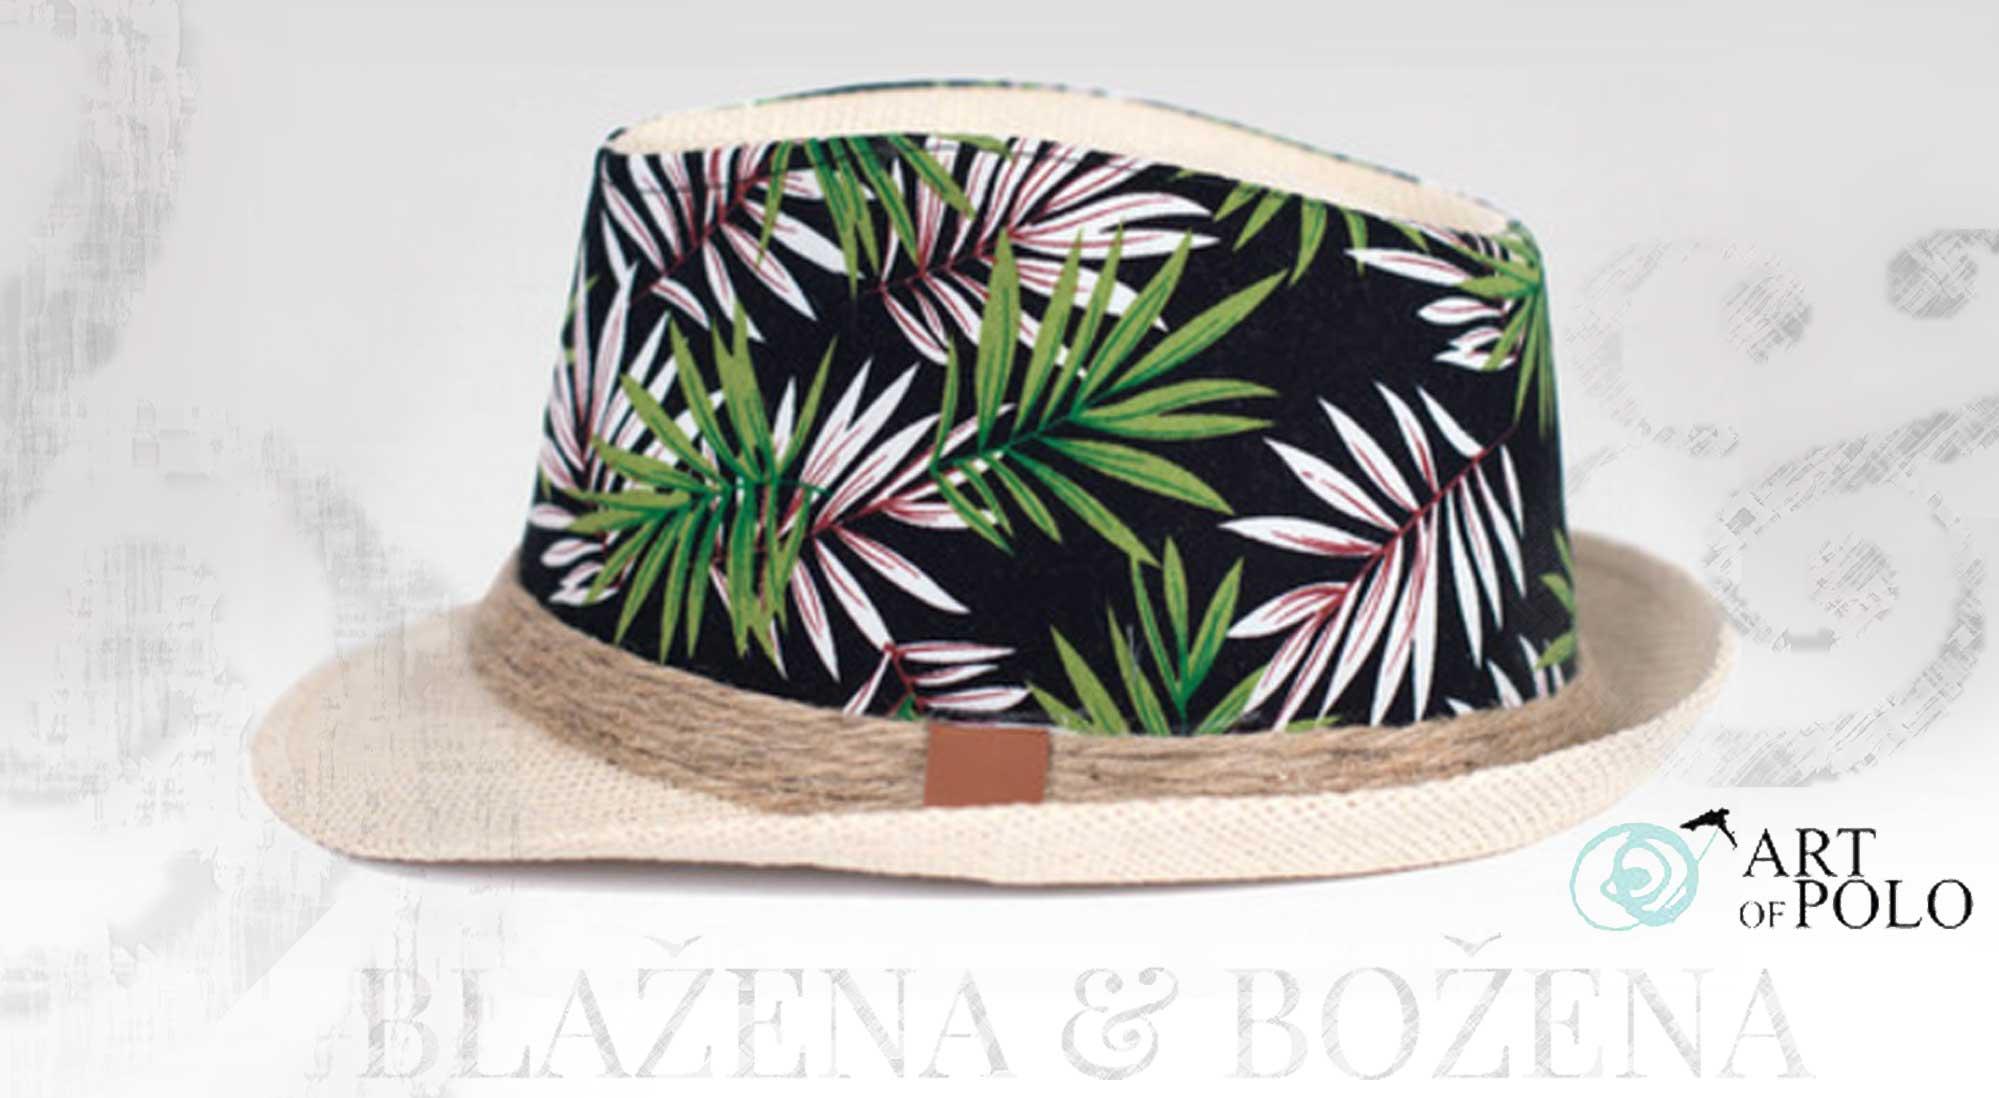 Grenada – slaměný klobouk se vzorem – Blažena Božena 5163cc64f4